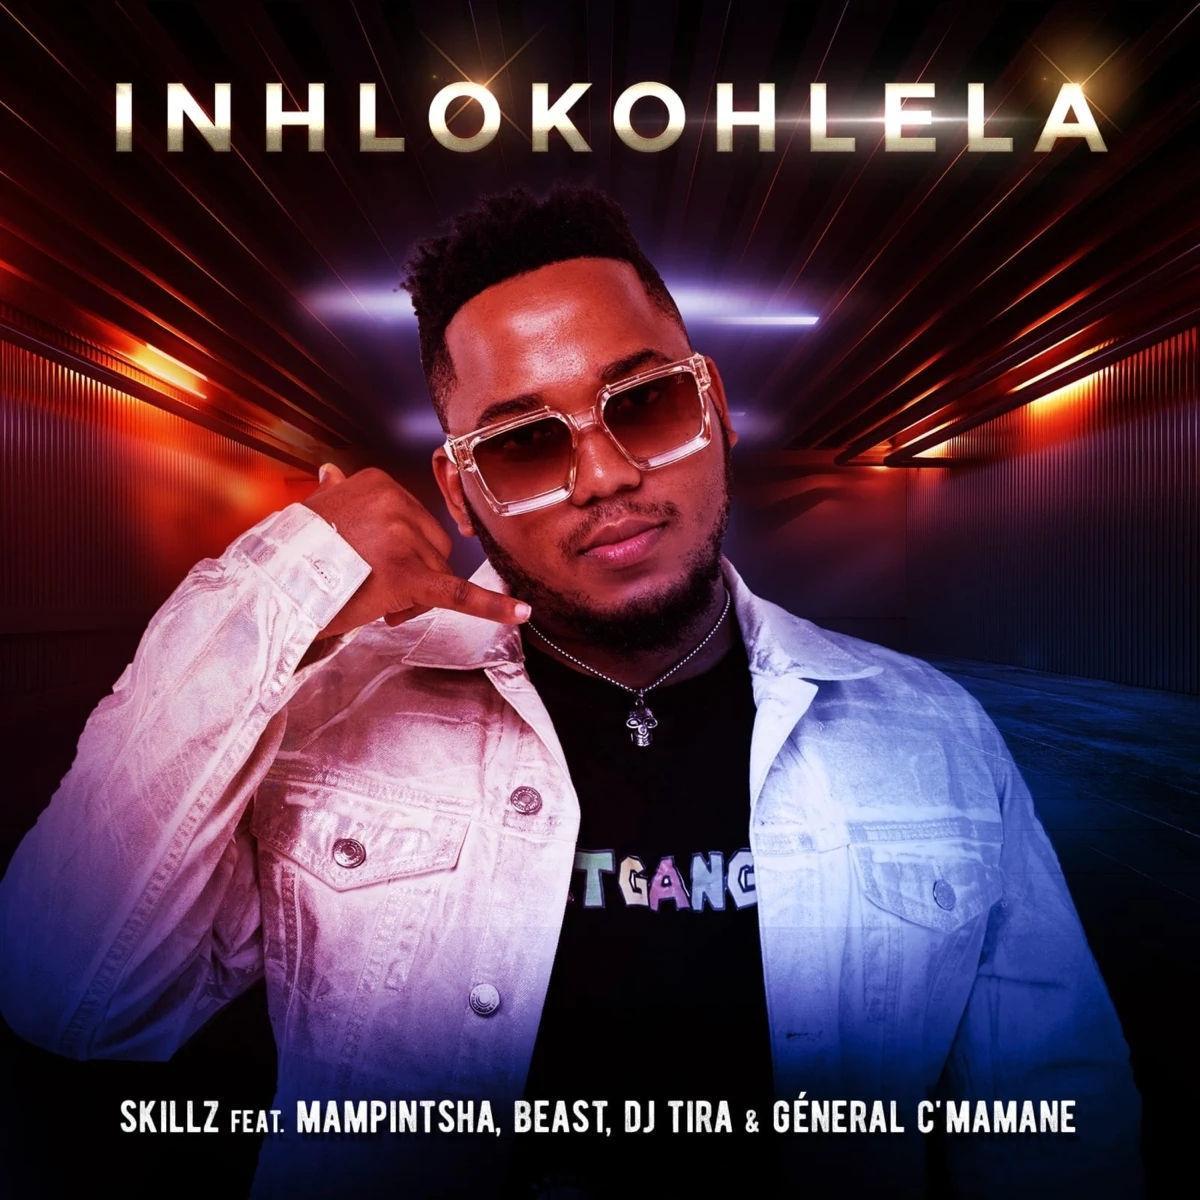 Skillz - Inhlokohlela (feat. DJ Tira, Mampintsha, Beast & General C'mamane)